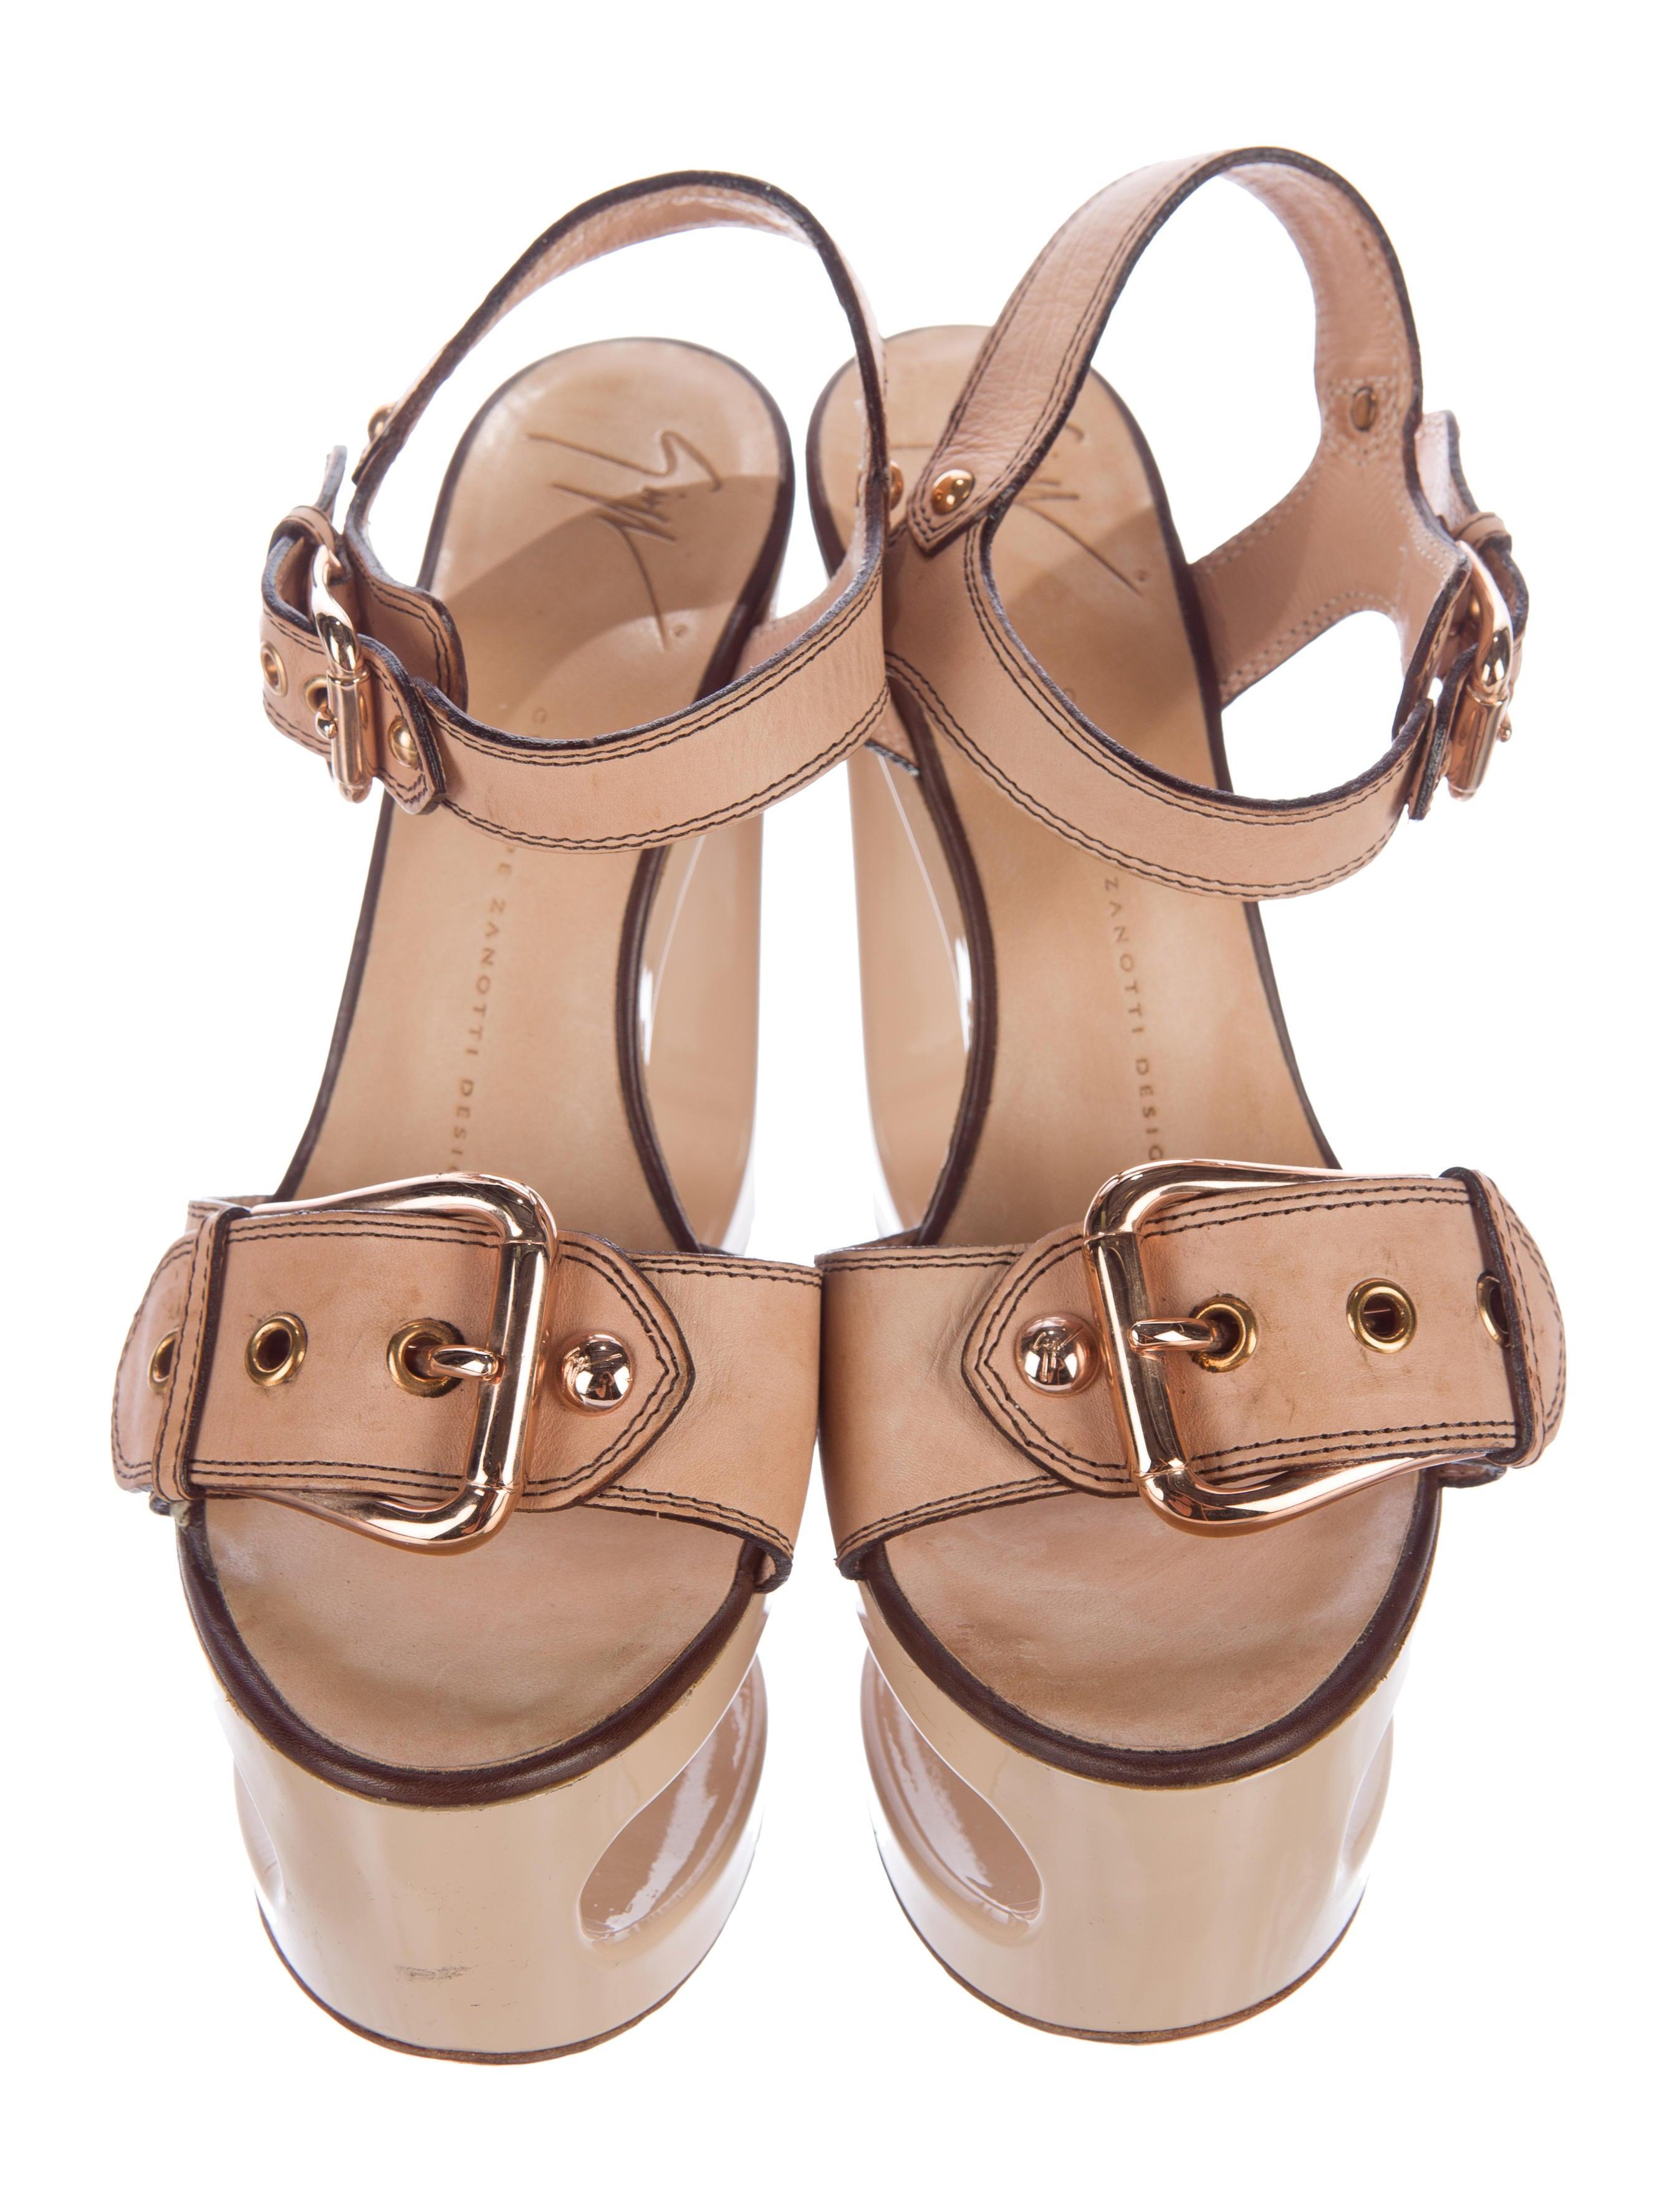 Giuseppe Zanotti Cutout Wedge Sandals - Shoes